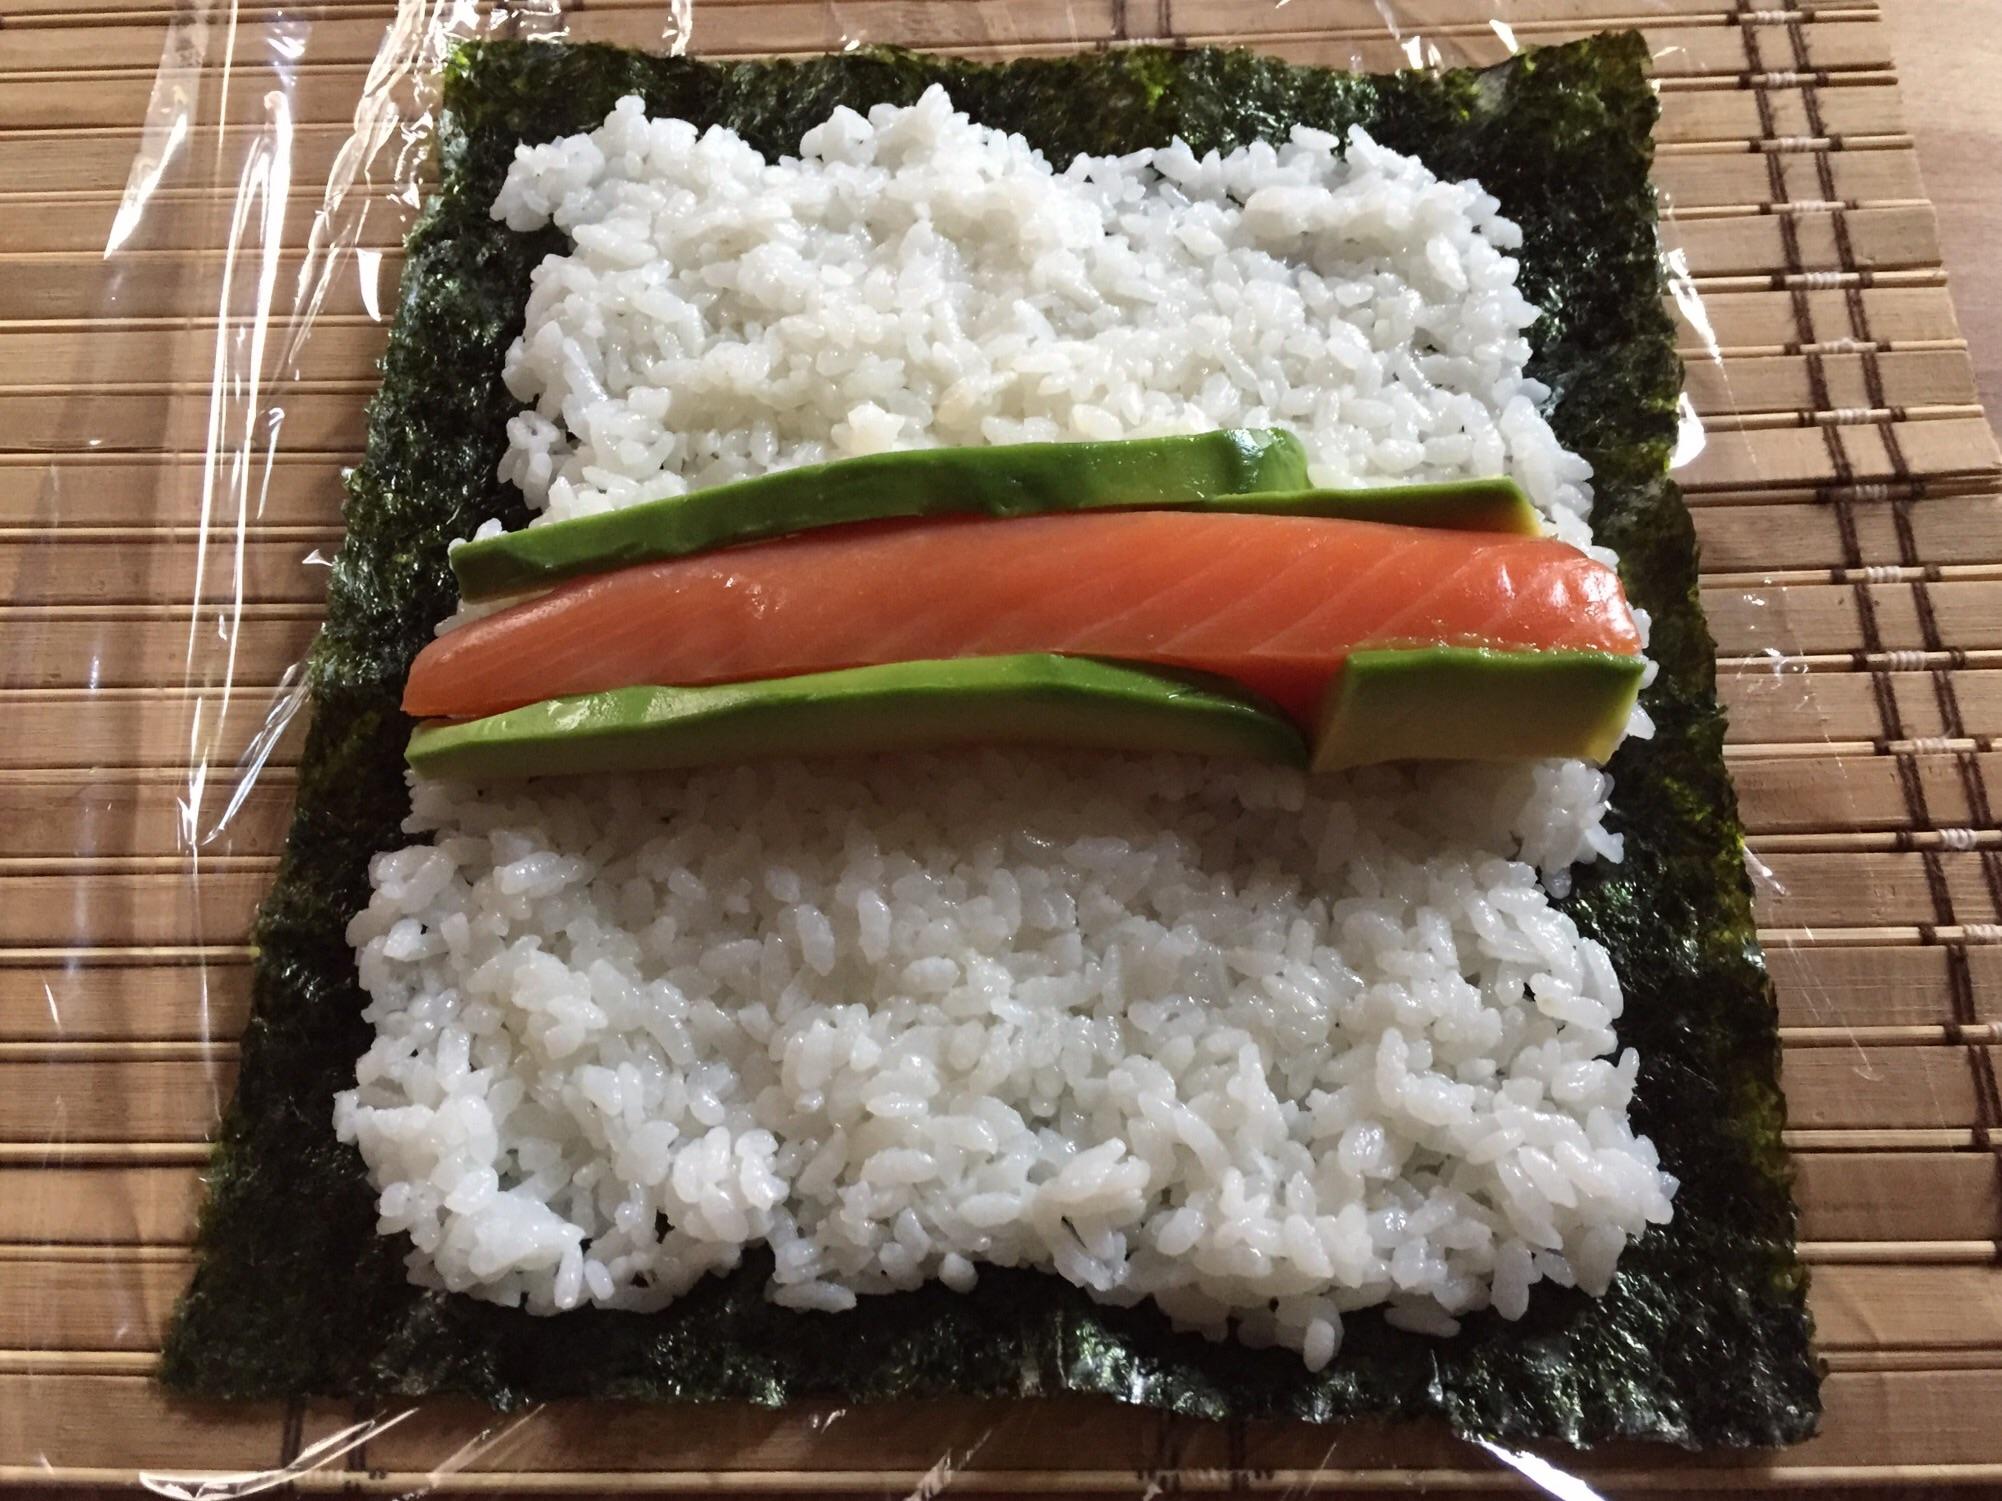 I miei makisushi senza glutine  StellaSenzaGlutinecom